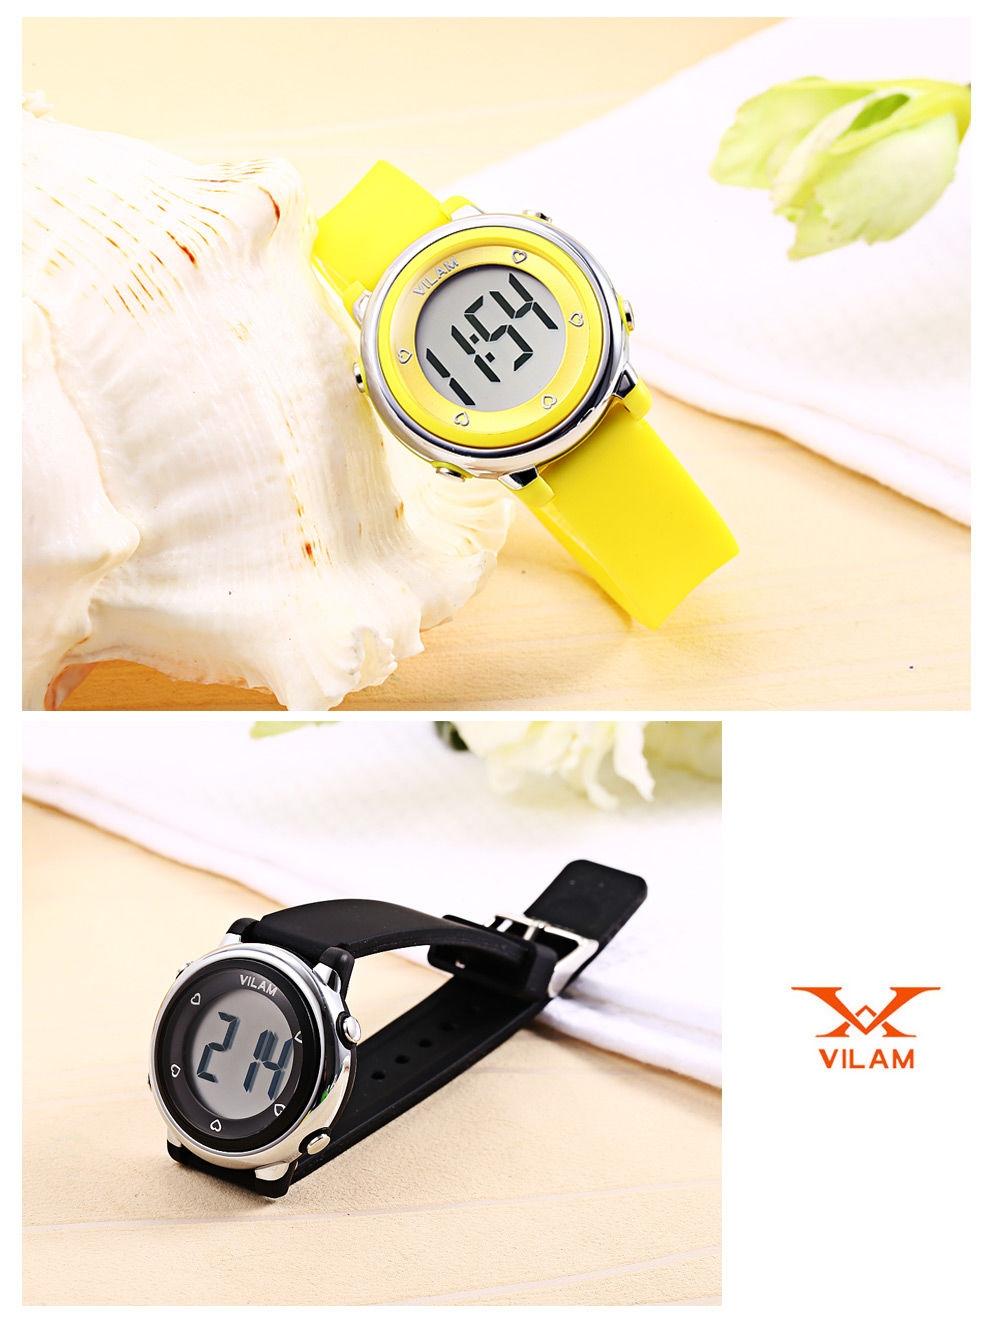 VILAM 06035 Kids Digital Sports Watch Calendar LED Light 50m Water Resistance Wristwatch